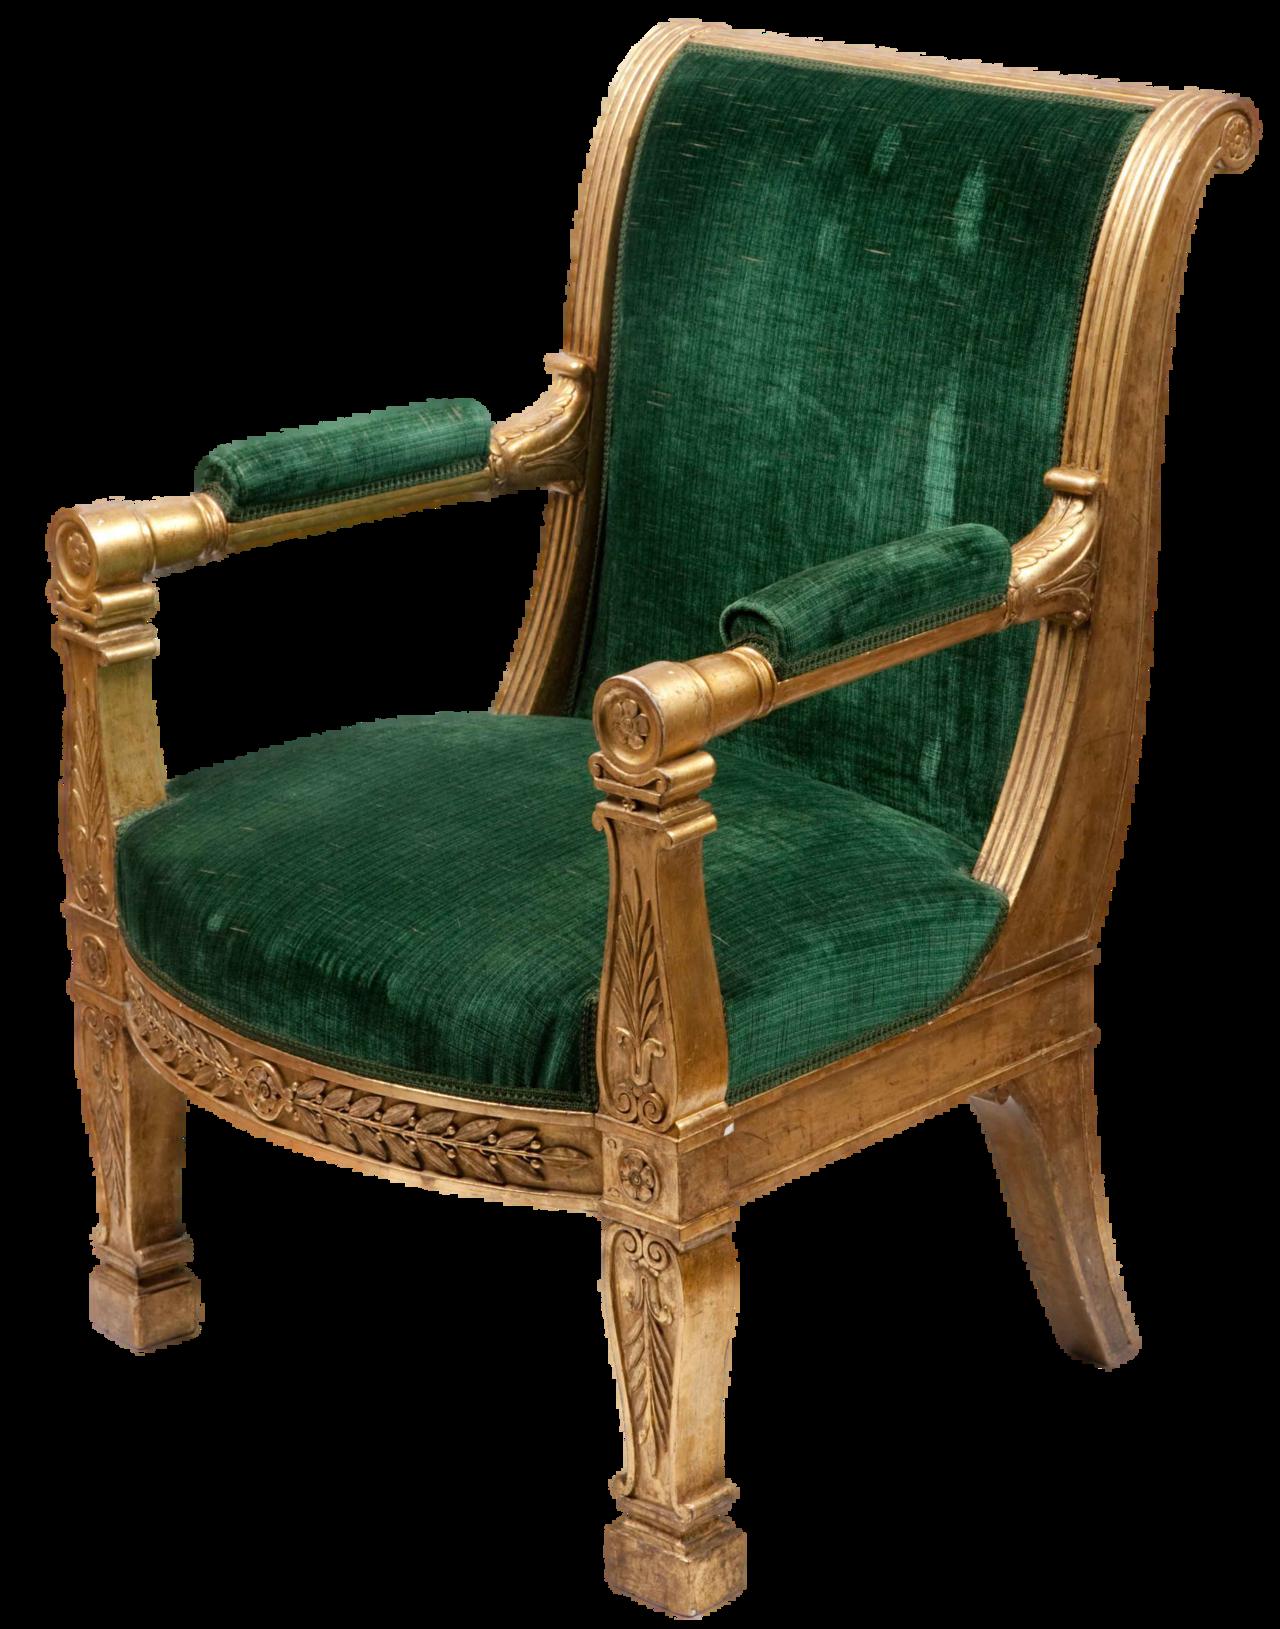 Benjamin Franklin Keith's Theater Seat